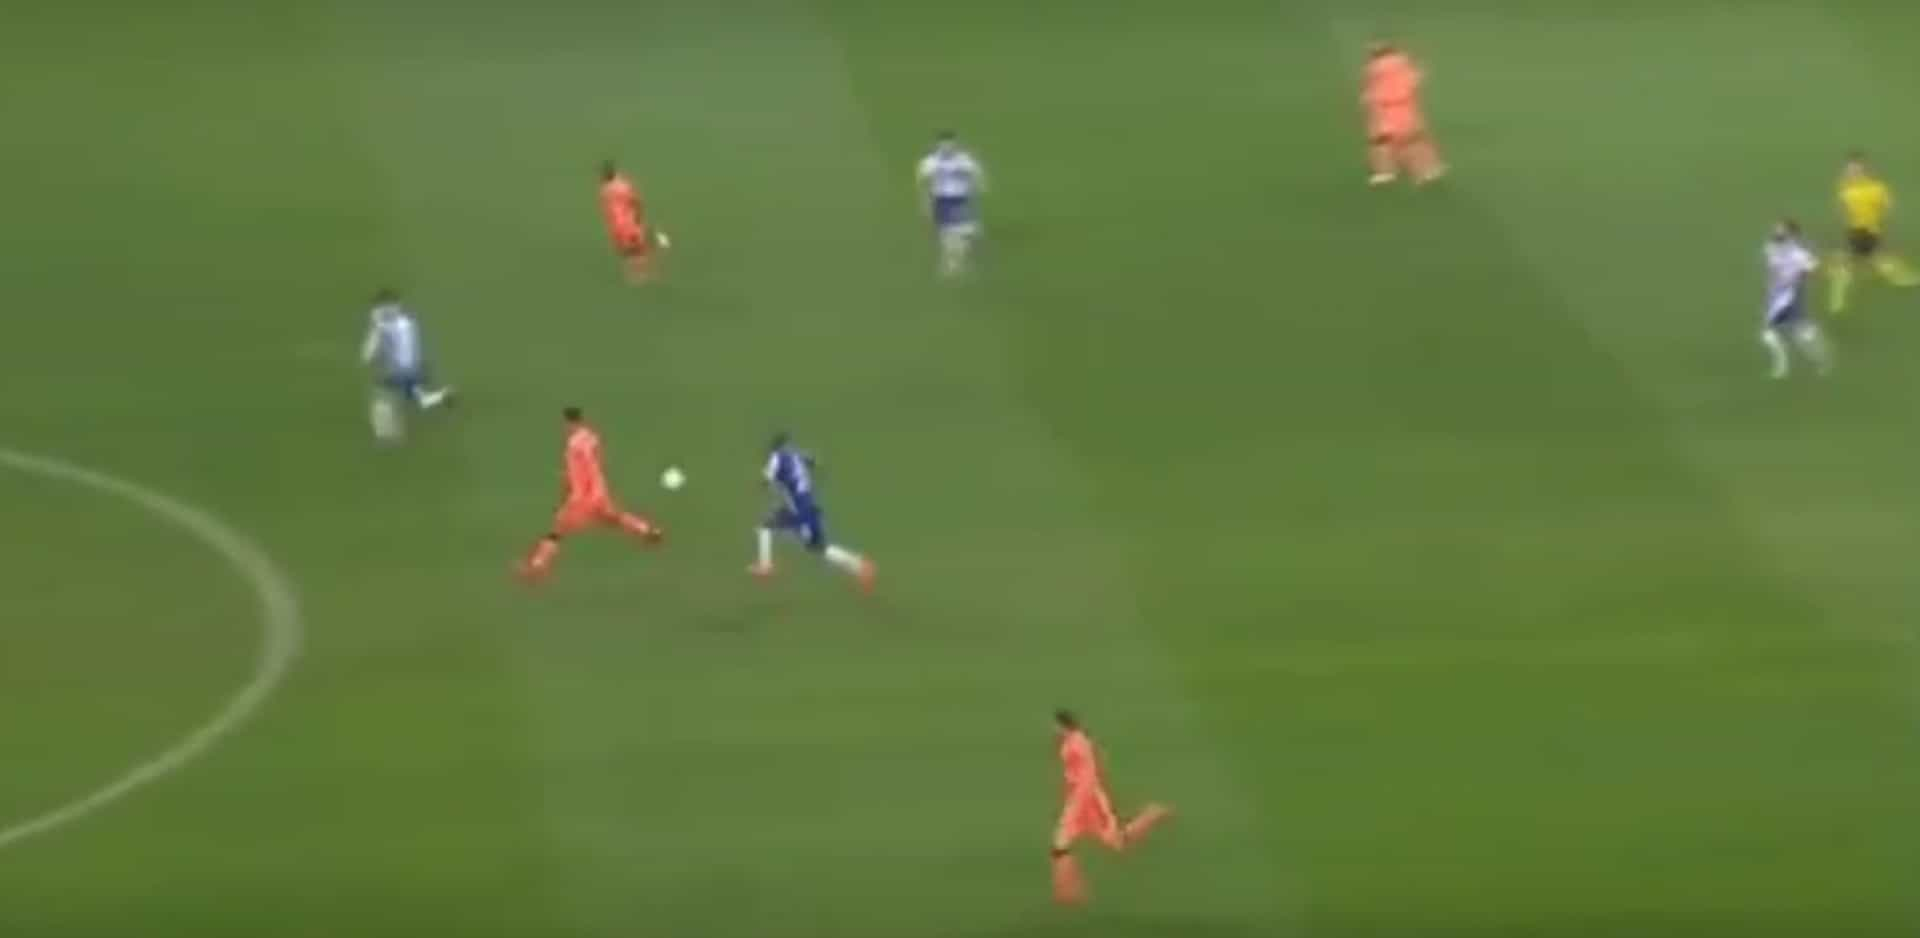 Liverpool chega ao terceiro: Continua a noite 'horribilis' para José Sá